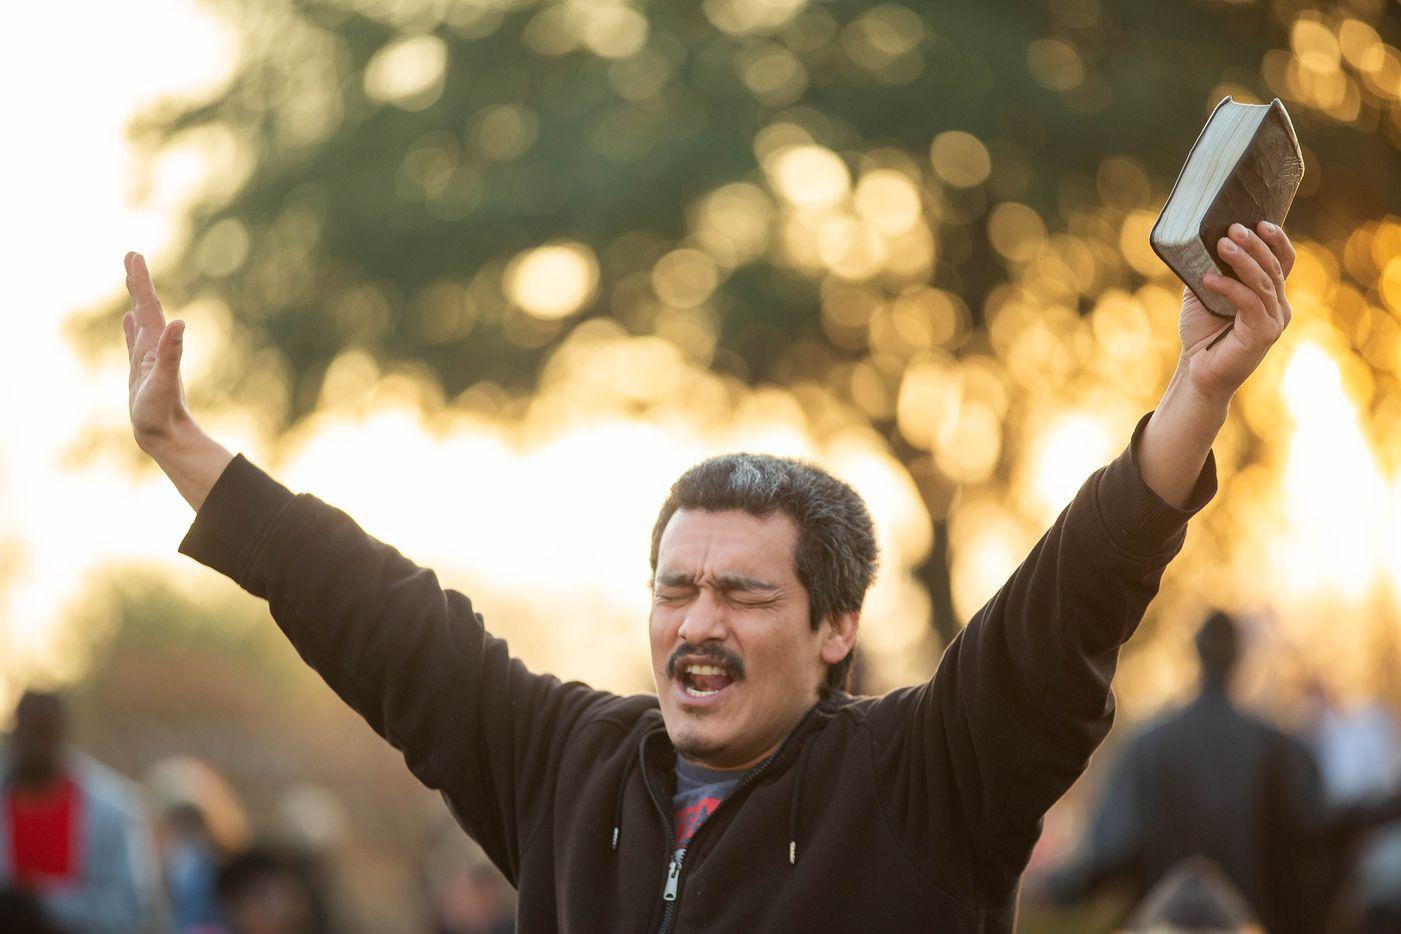 Carlos Pena sang along to worship music at S.O.U.L. Church in downtown Dallas on Dec. 8, 2019.